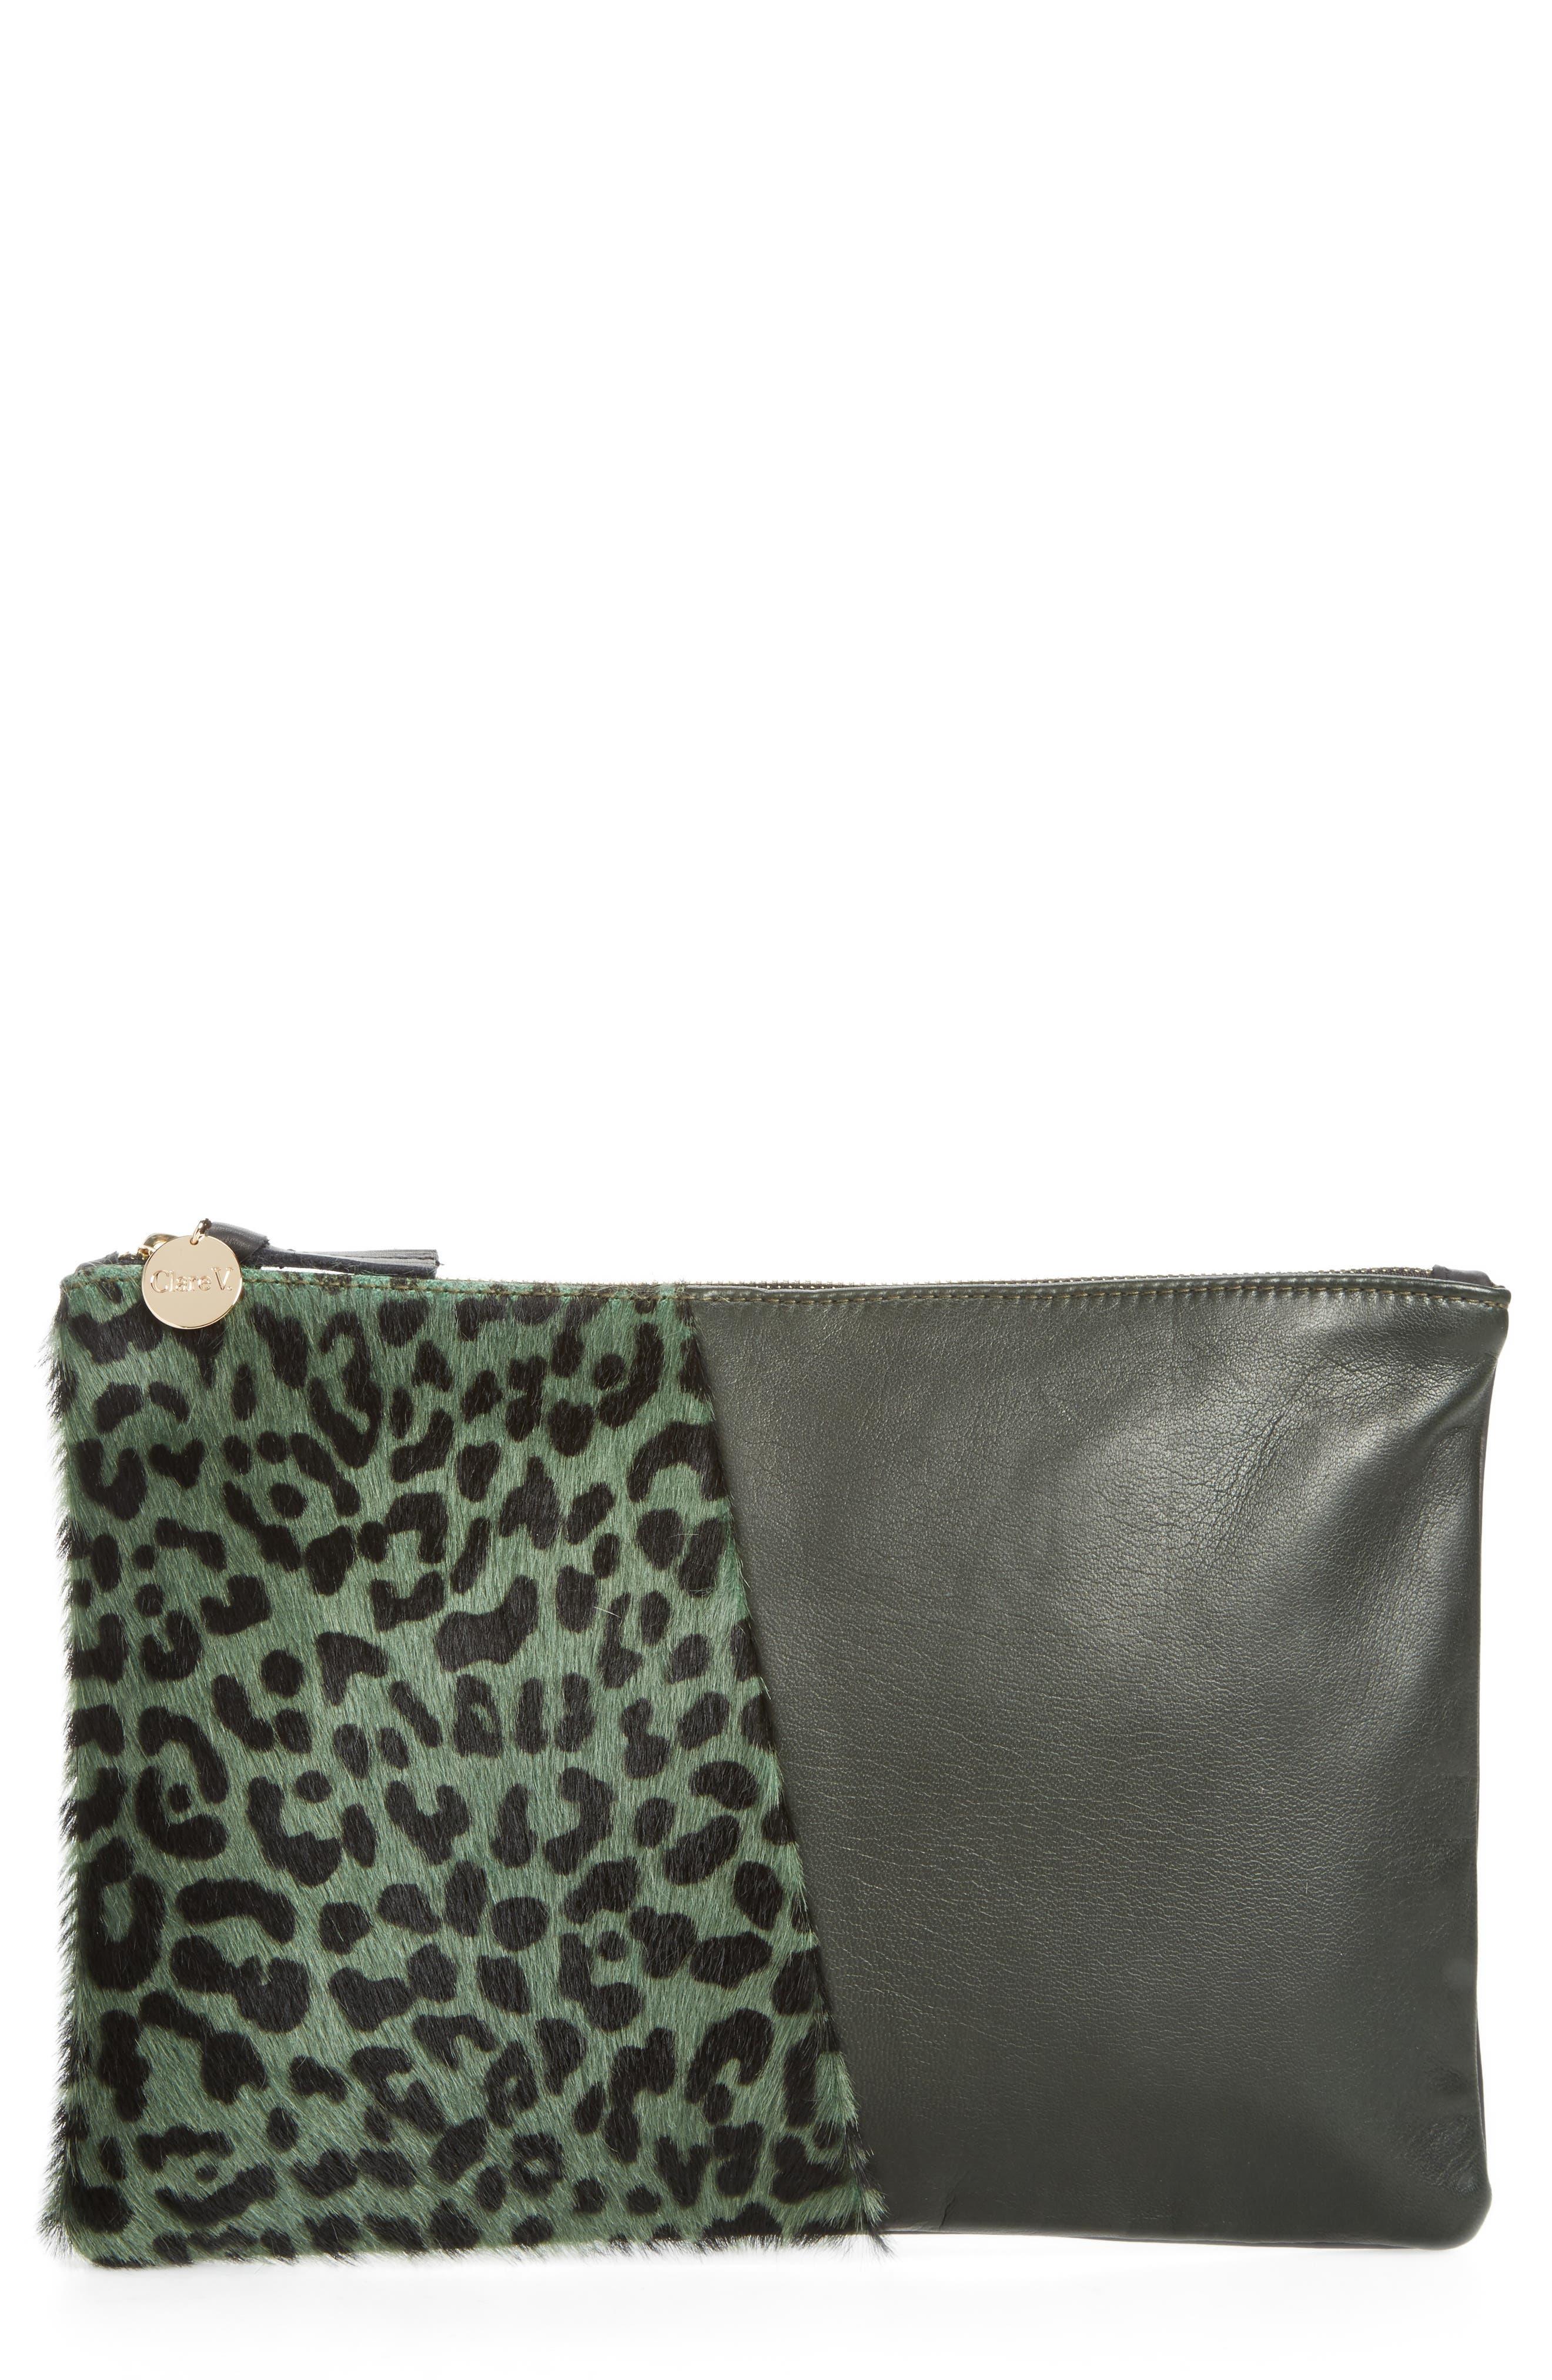 Clare V. Colorblock Leather & Genuine Calf Hair Flat Clutch